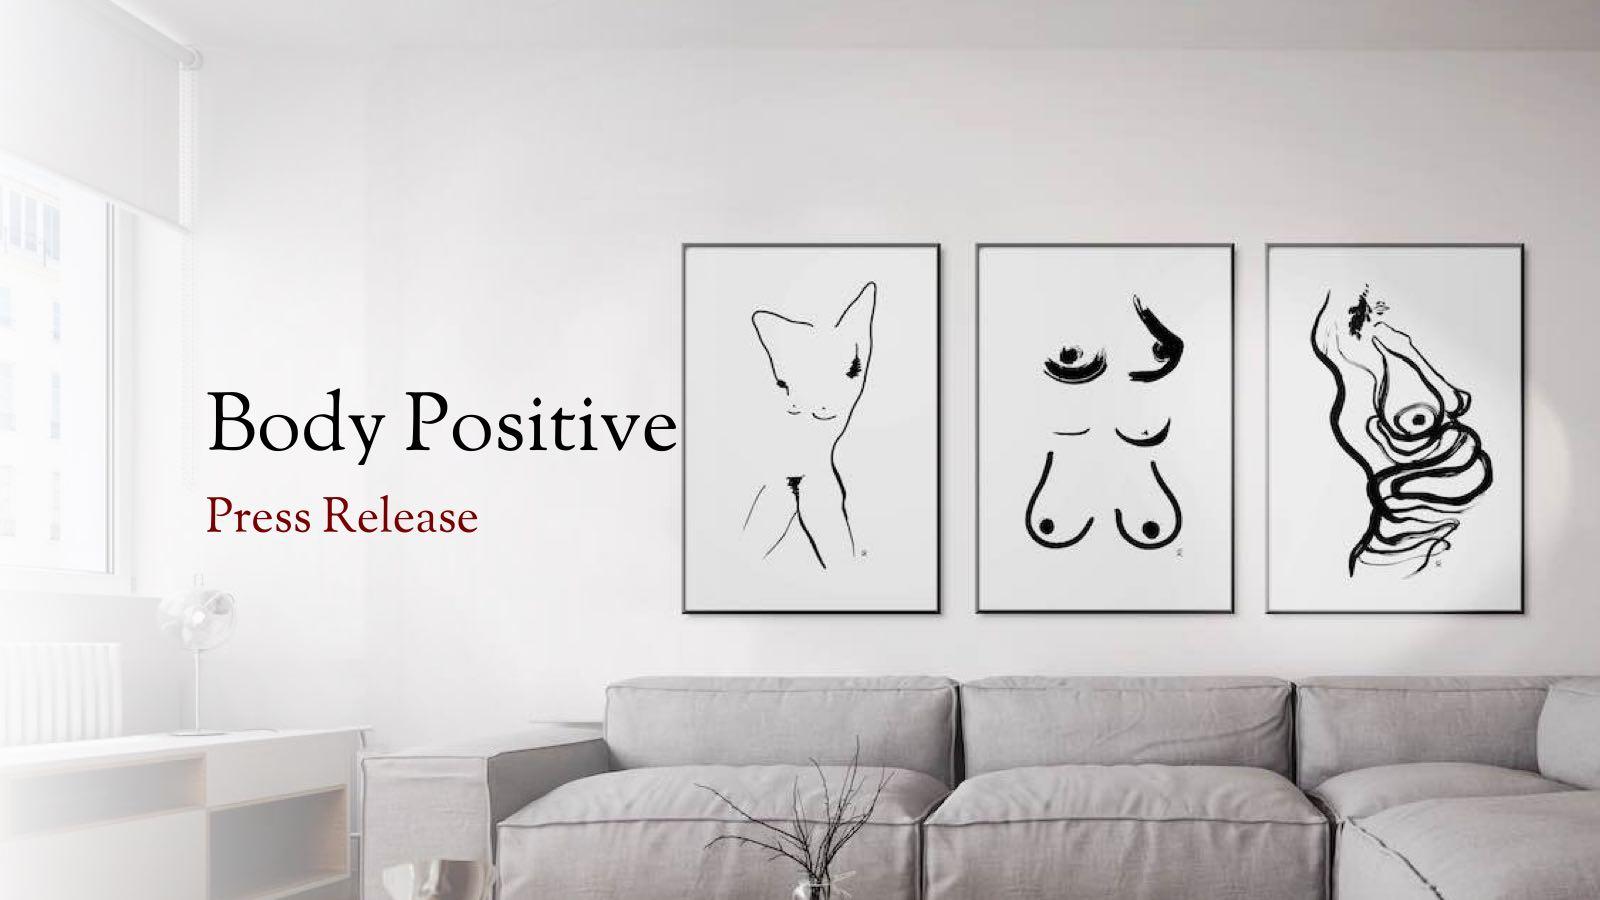 body positive press release 2